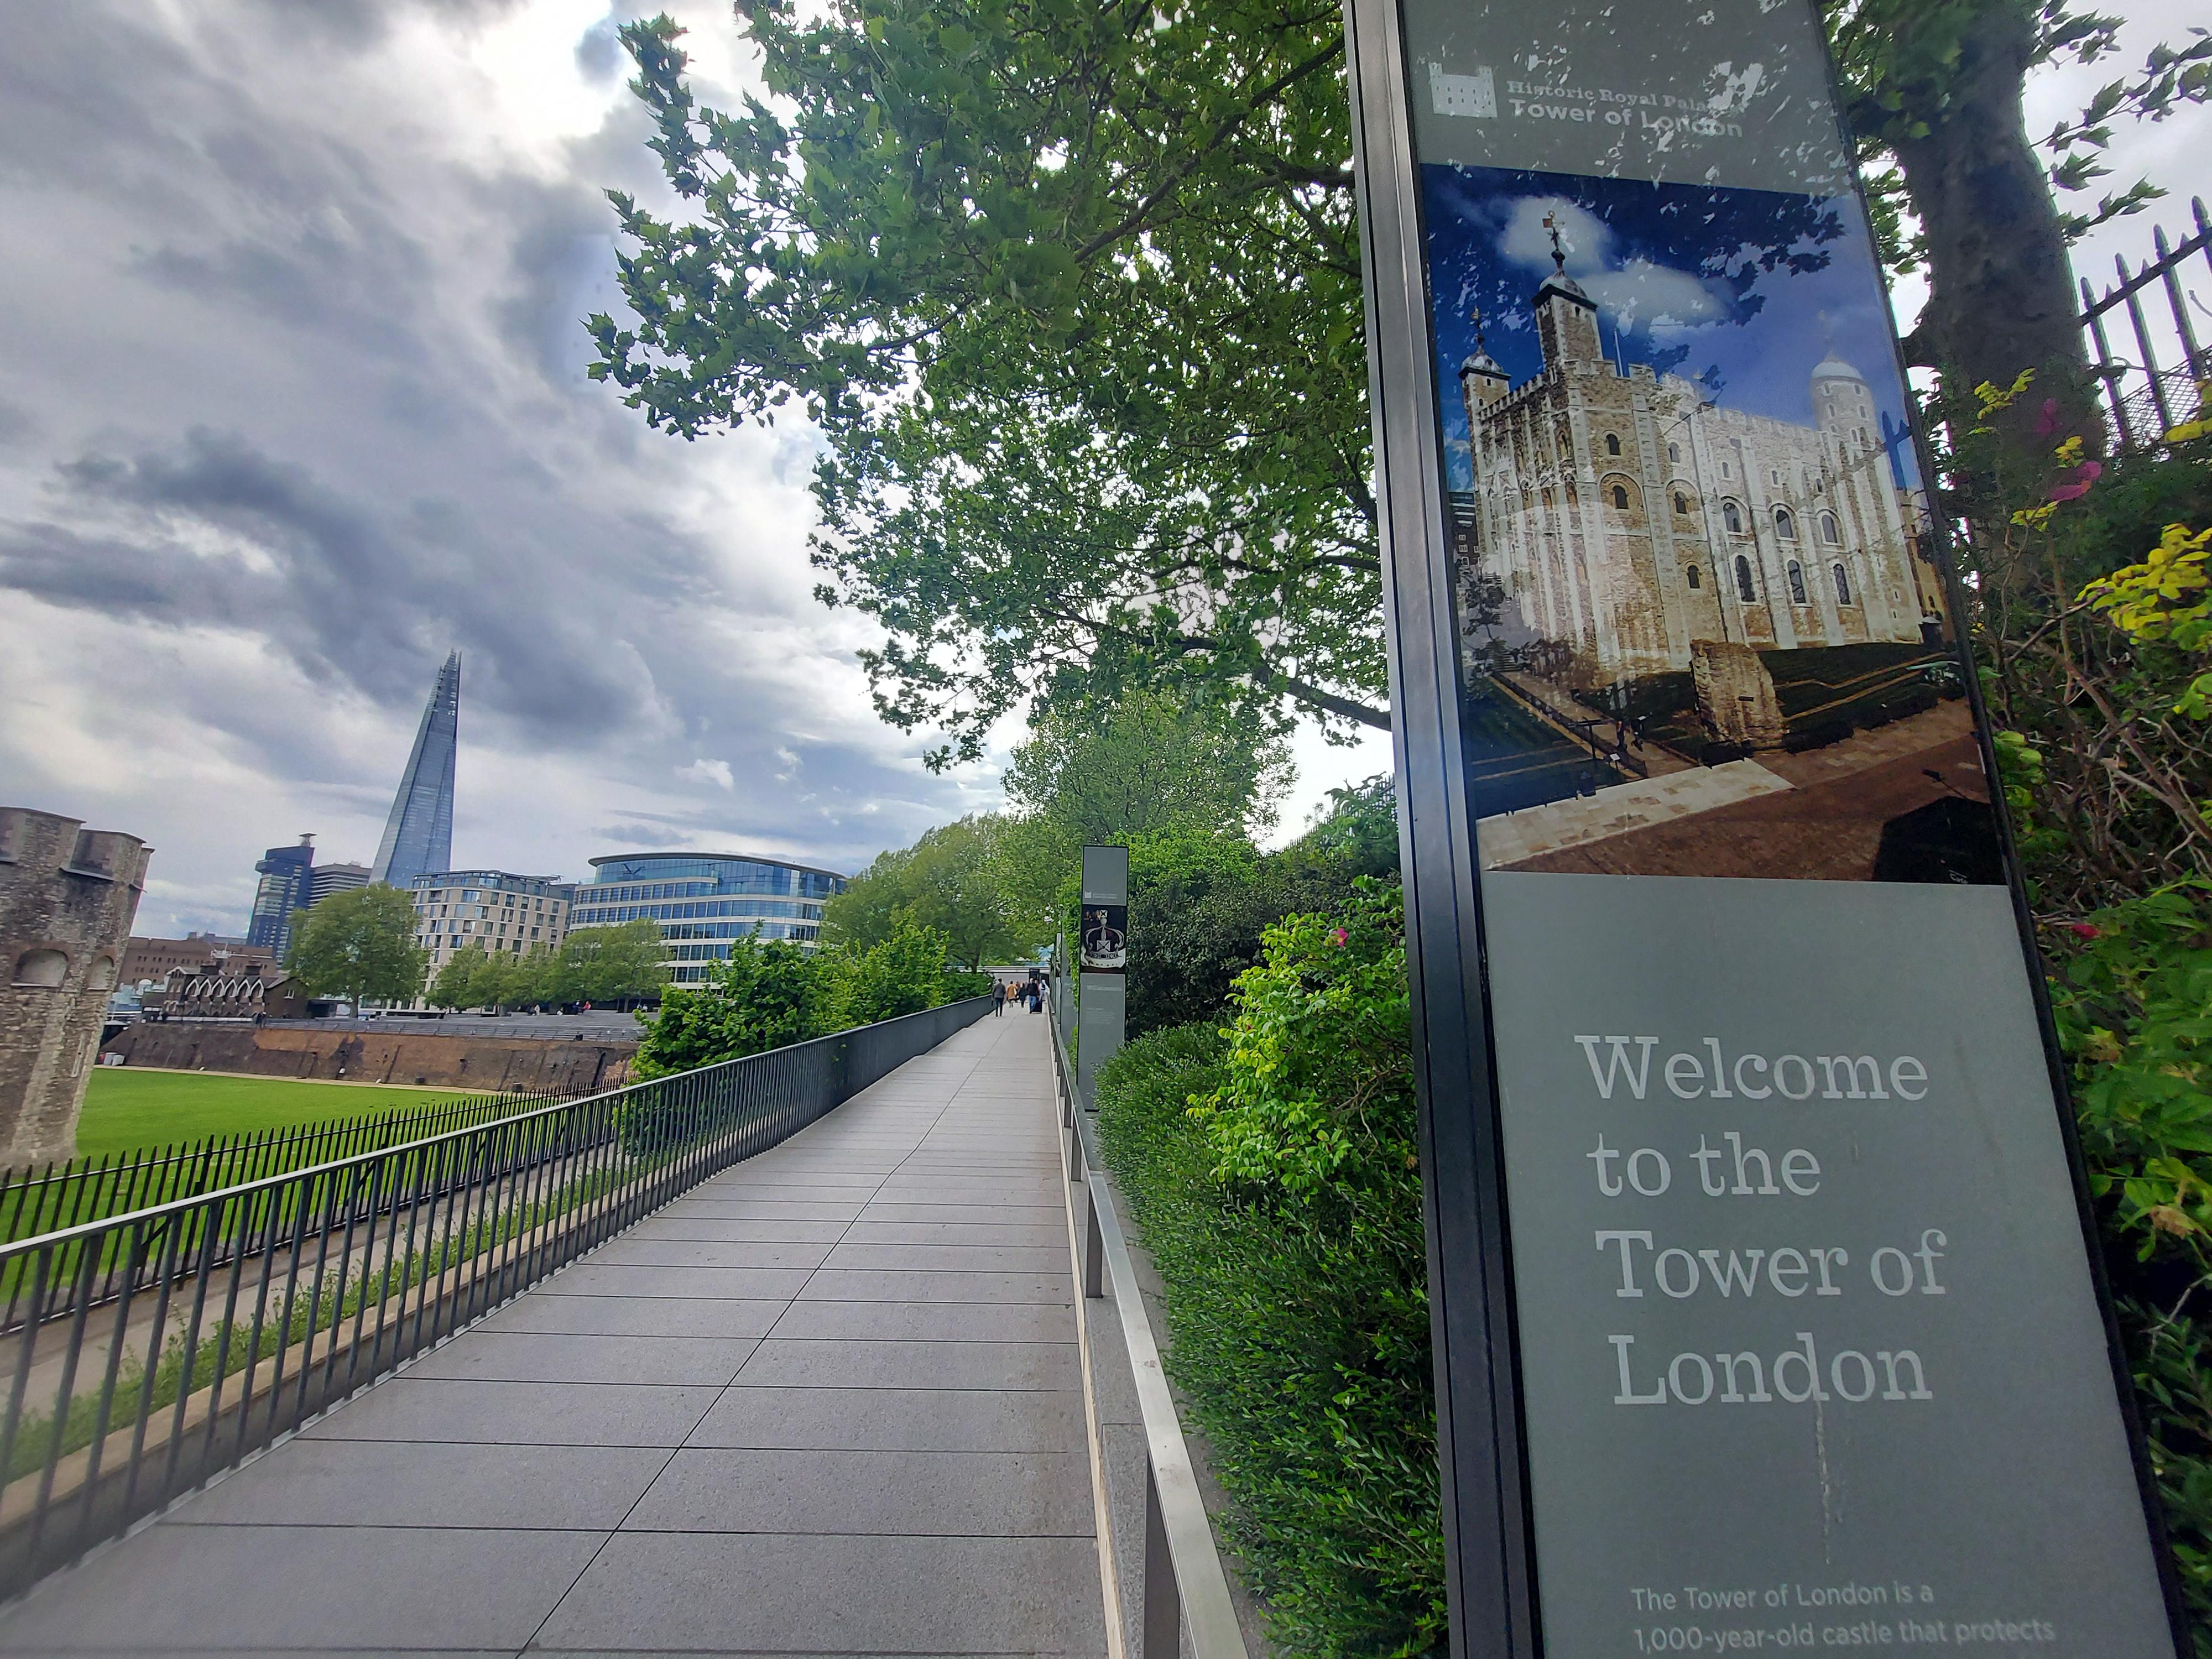 Tower-Hill-run-jog-healthybodyhealthyplanet-blog10